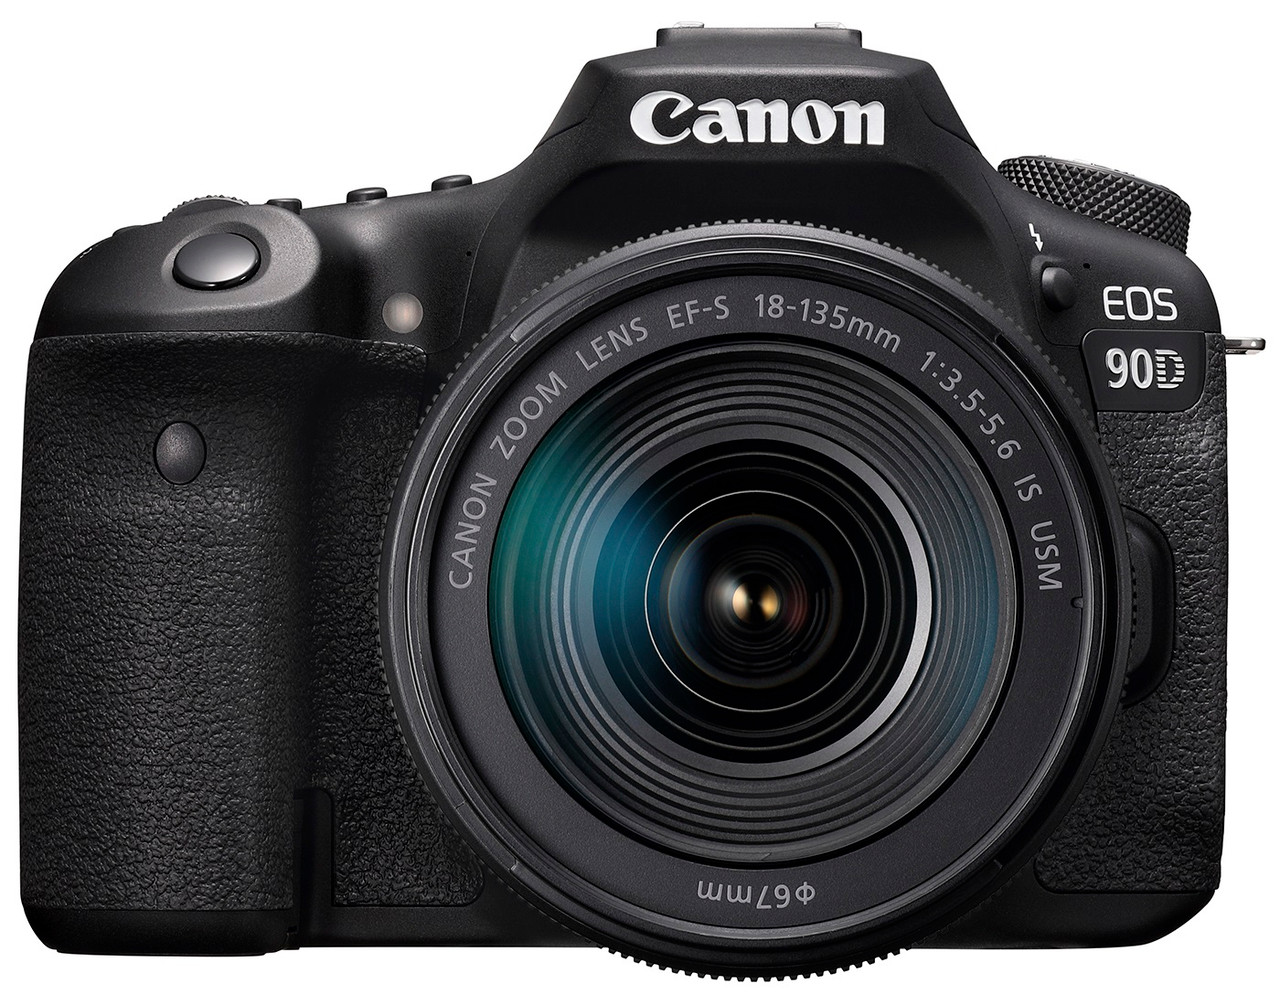 Canon EOS 90D Digital SLR Camera with EF-S 18-135mm IS USM Lens